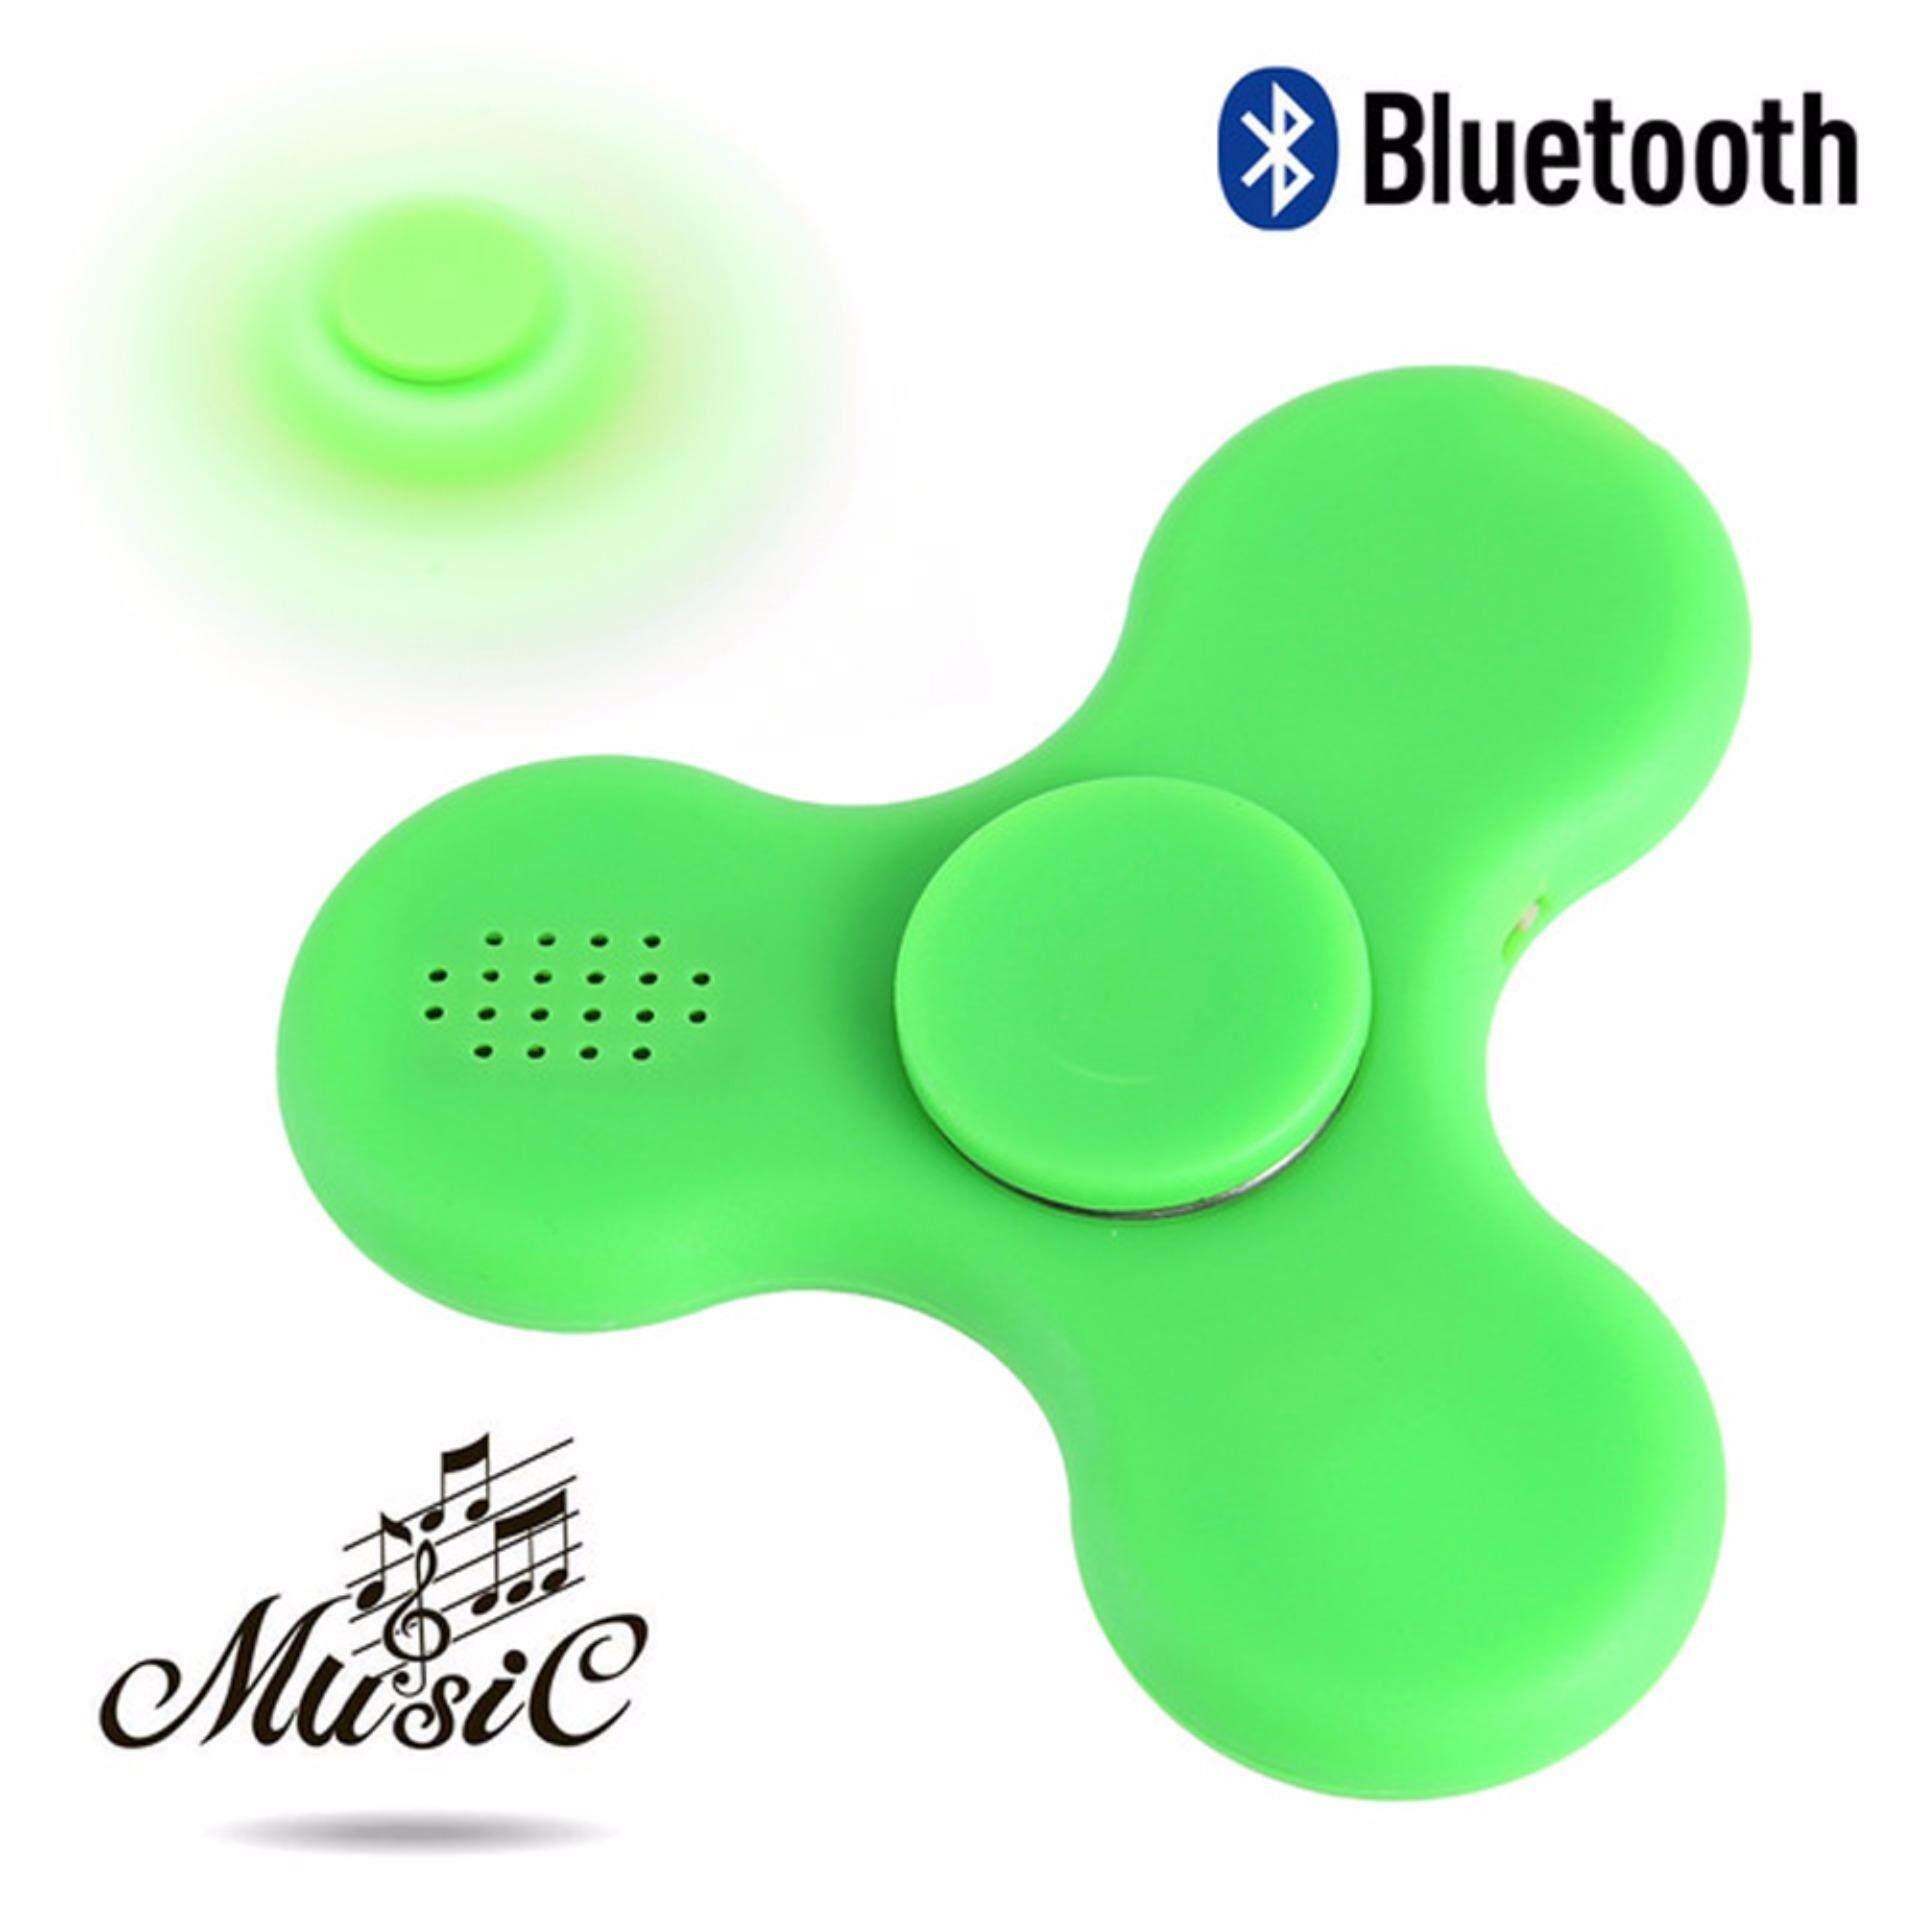 Buy Sell Cheapest Fidget Spinner Bluetooth Best Quality Product Spiner Led Nyala Creative Dengan Pembicara Isi Ulang Edc Tangan Fingertip Gyroscope Anti Stress